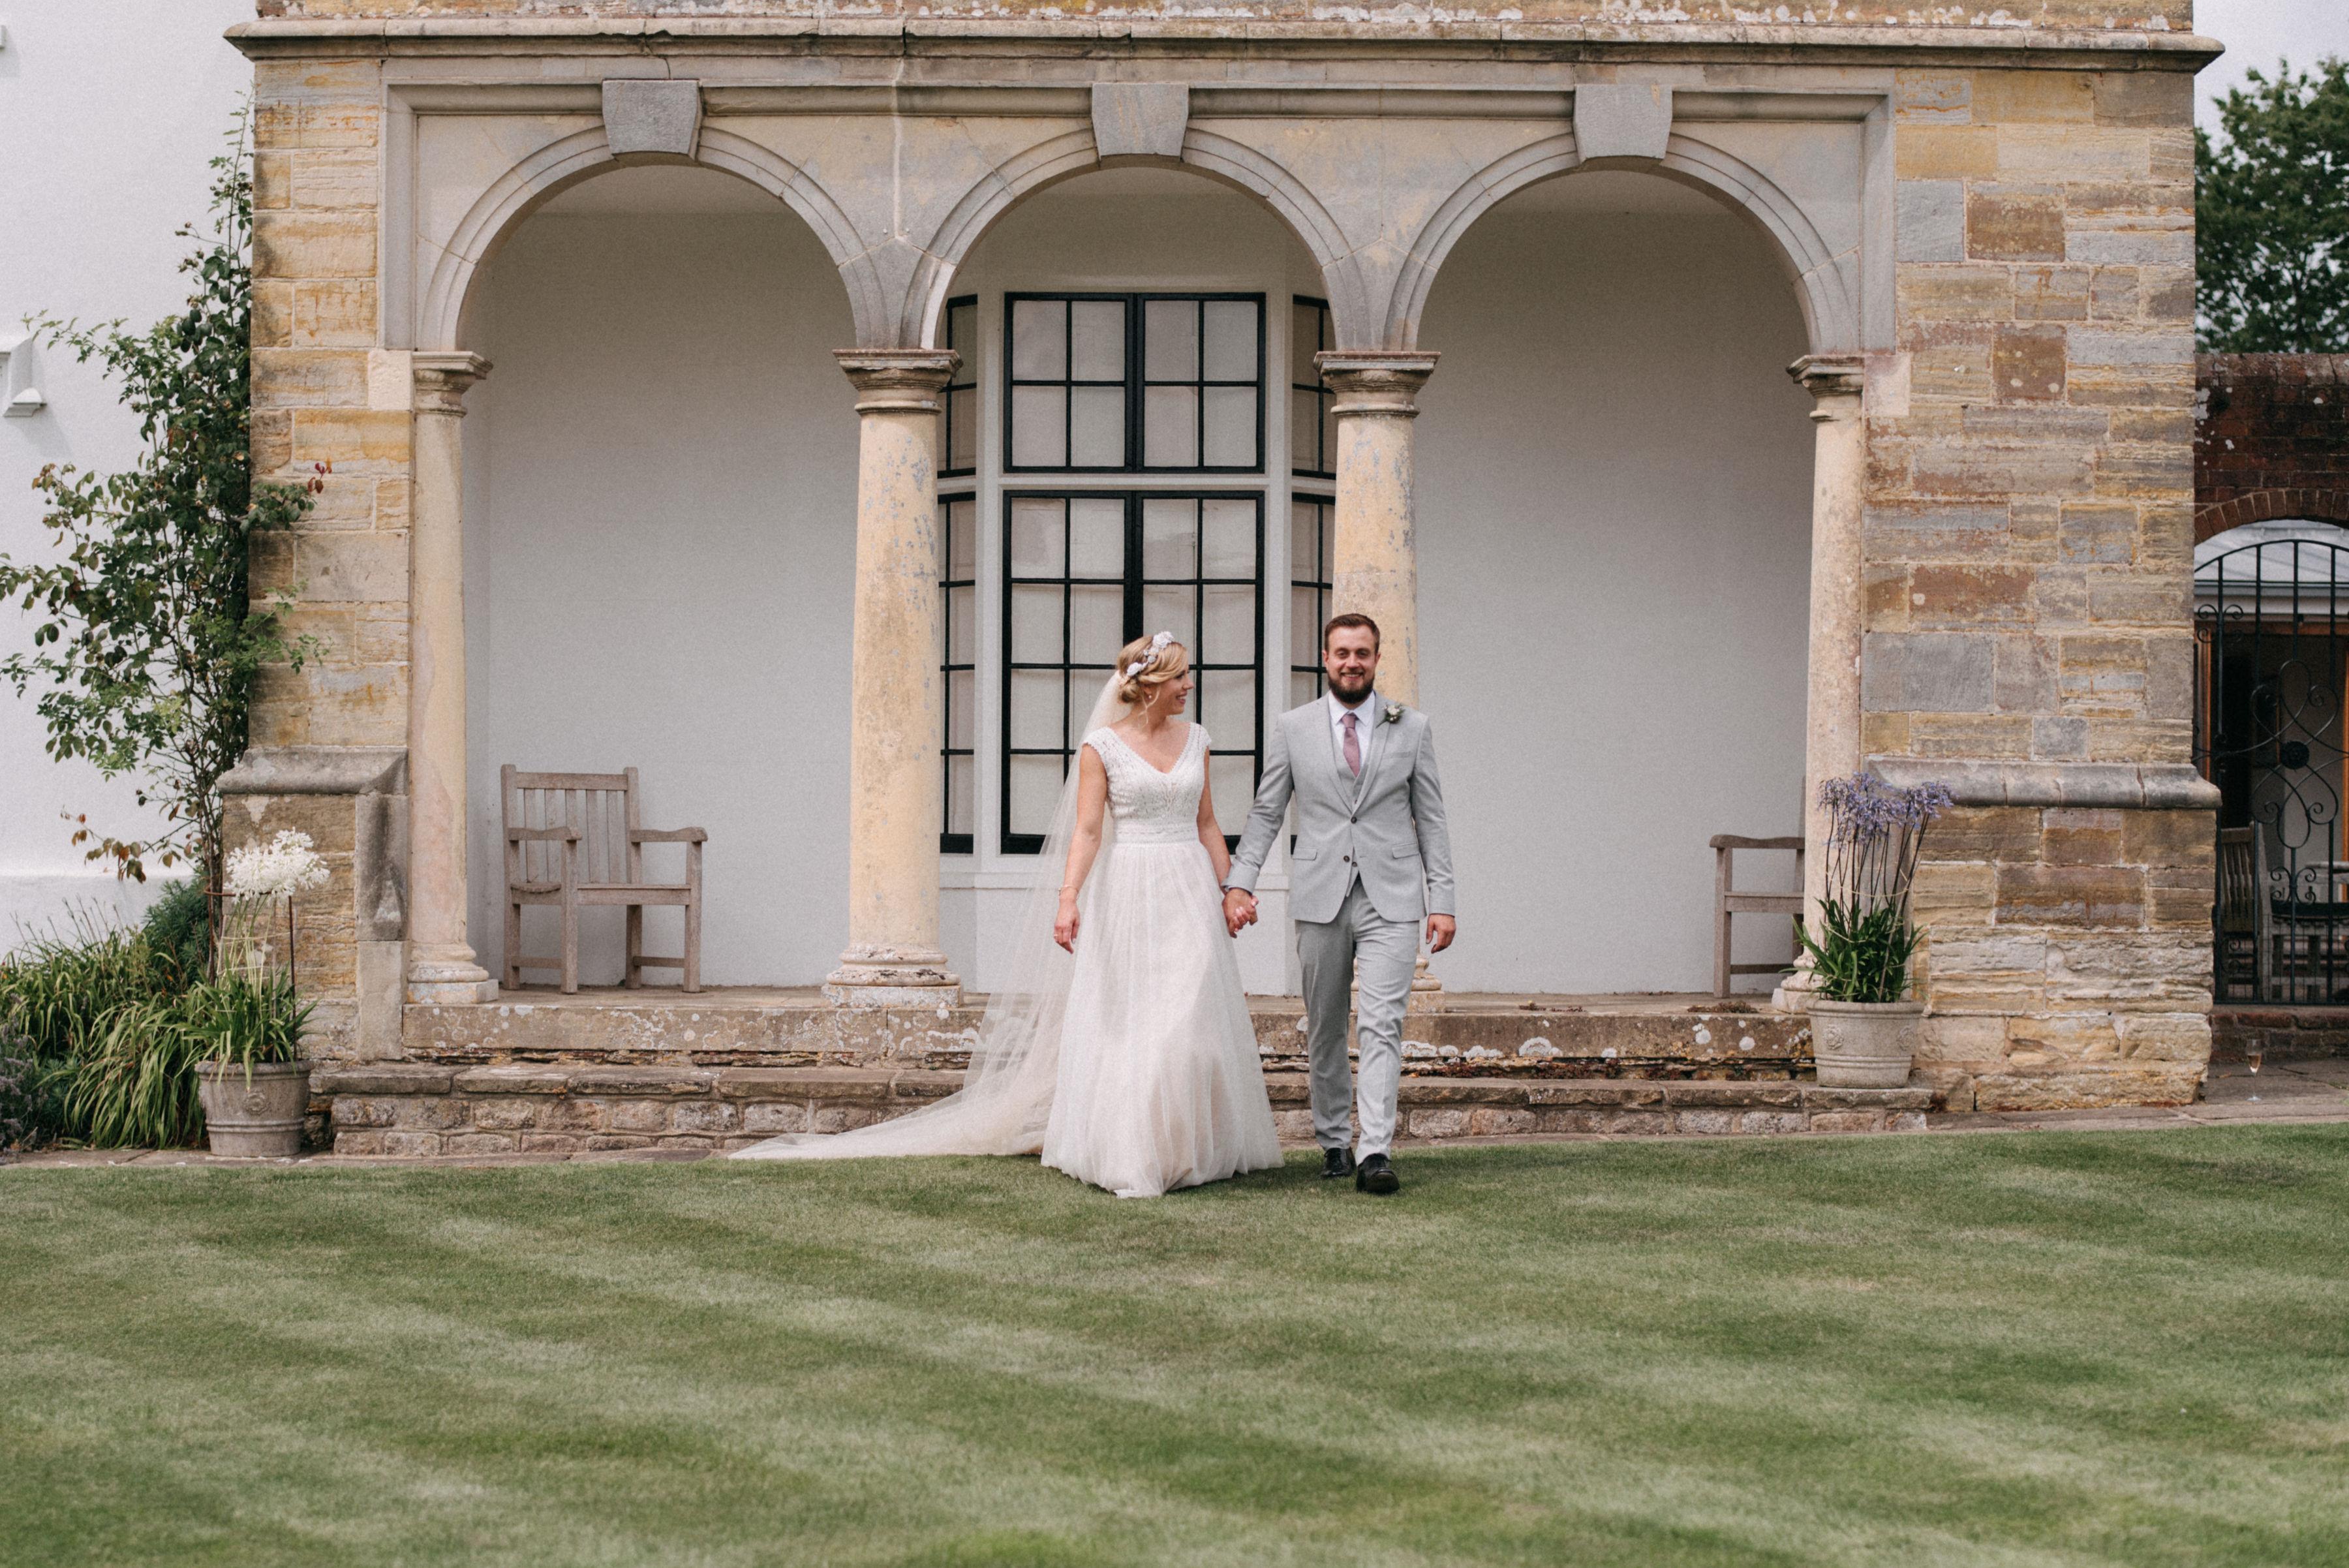 Sophia Veres Photography - Sussex Wedding day